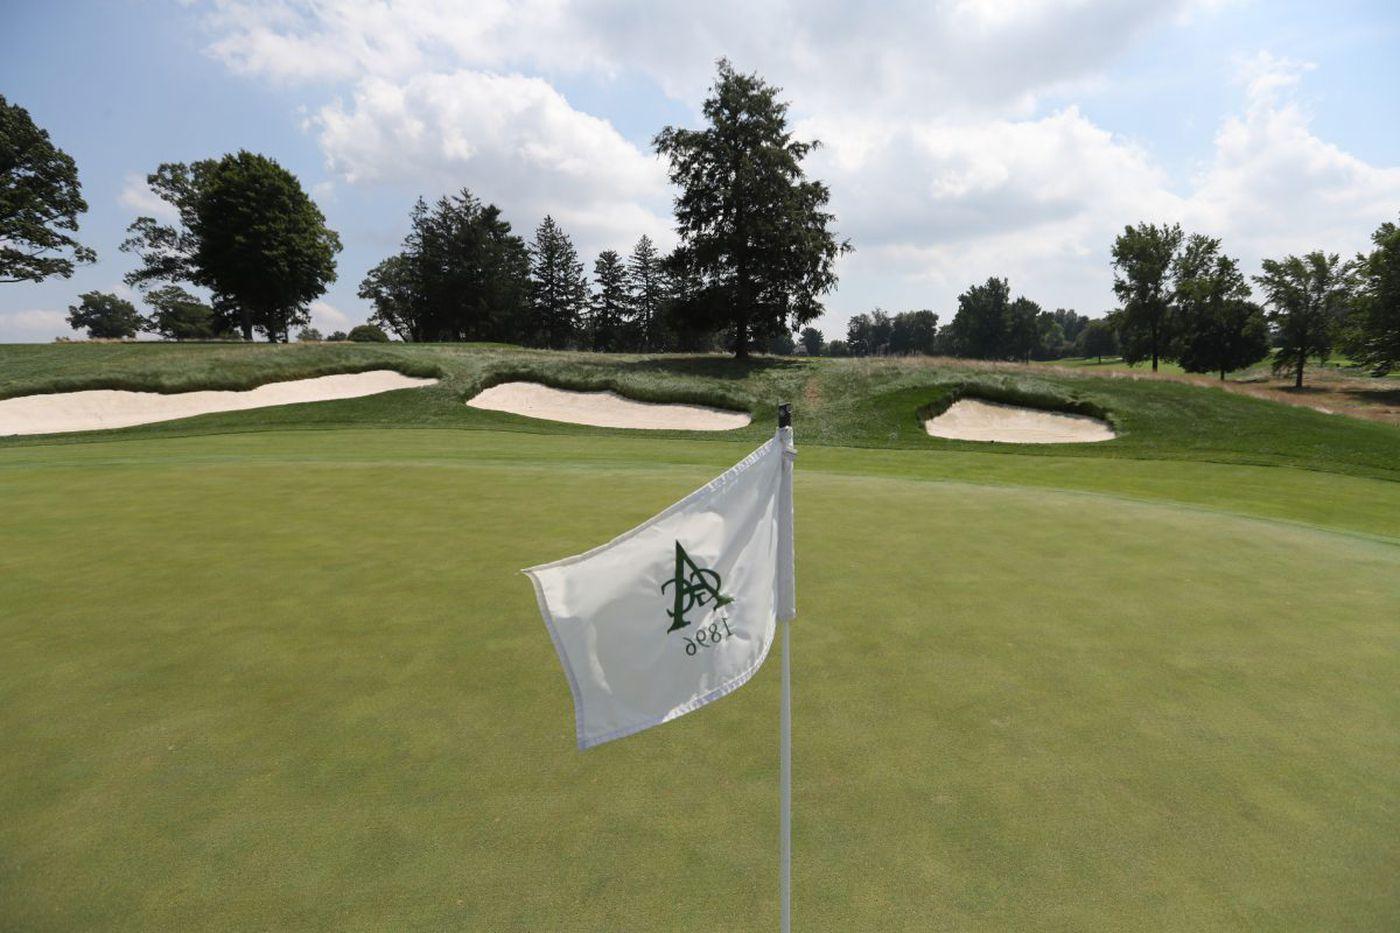 Sources: Aronimink to host 2027 PGA Championship, 2020 Women's PGA